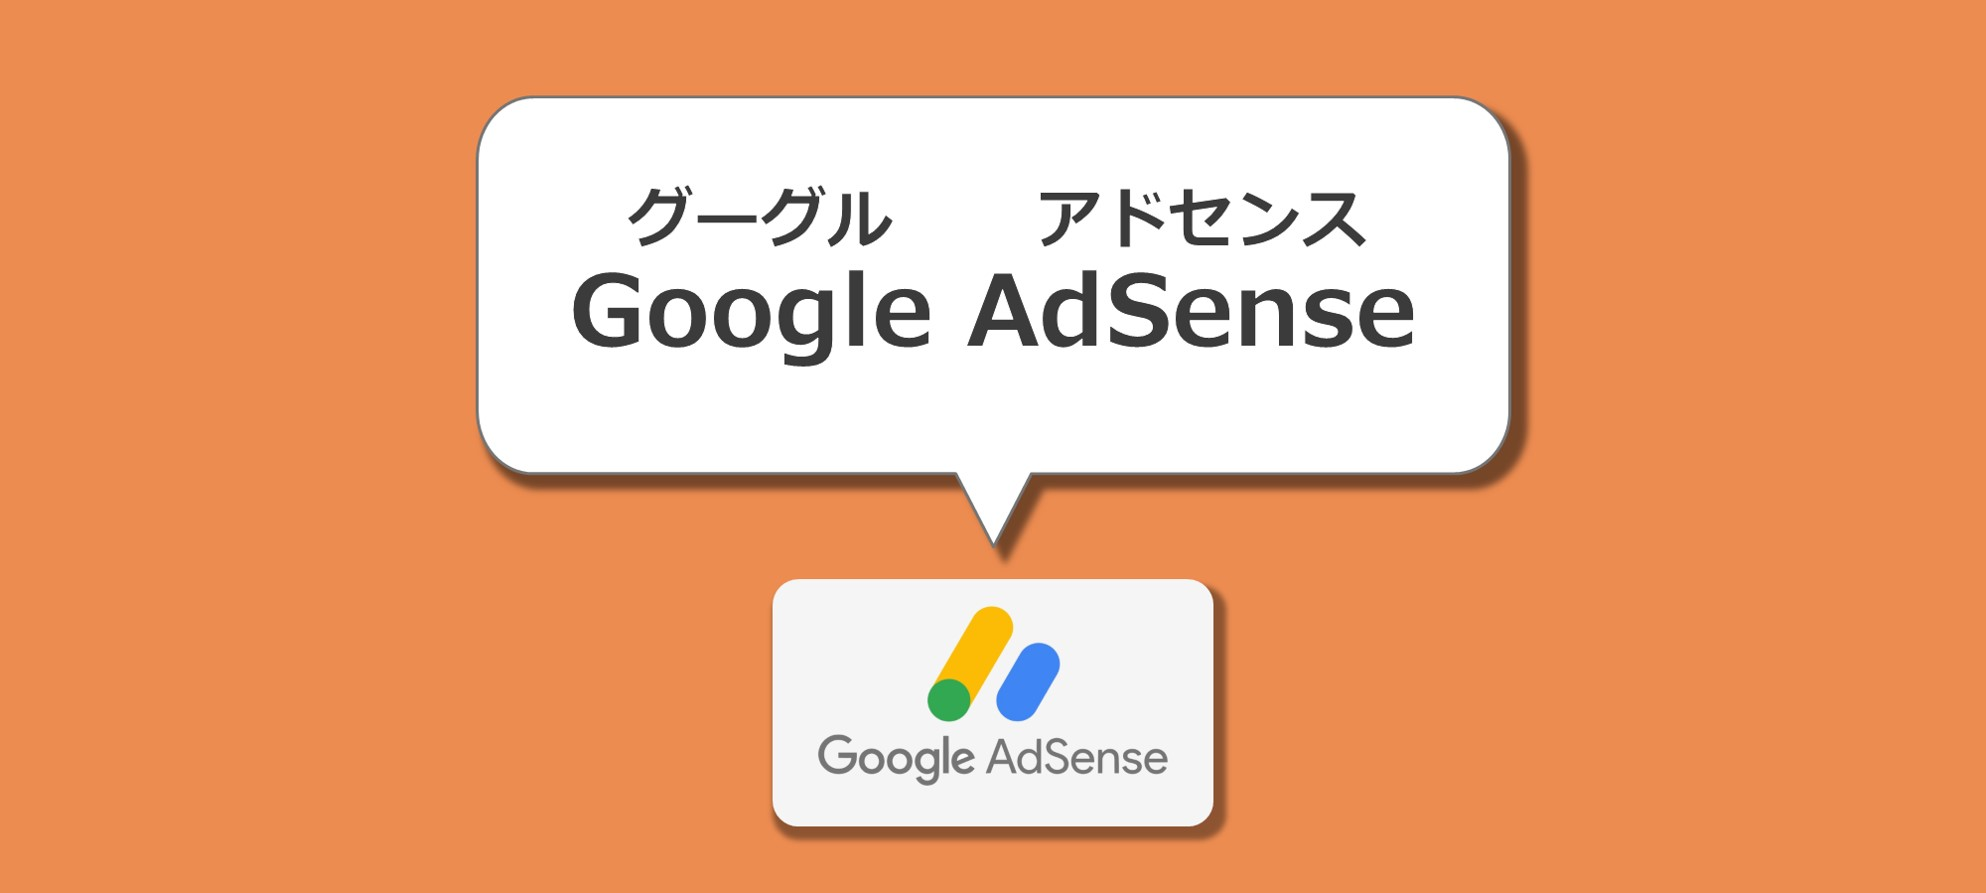 Google AdSense アドセンス関連